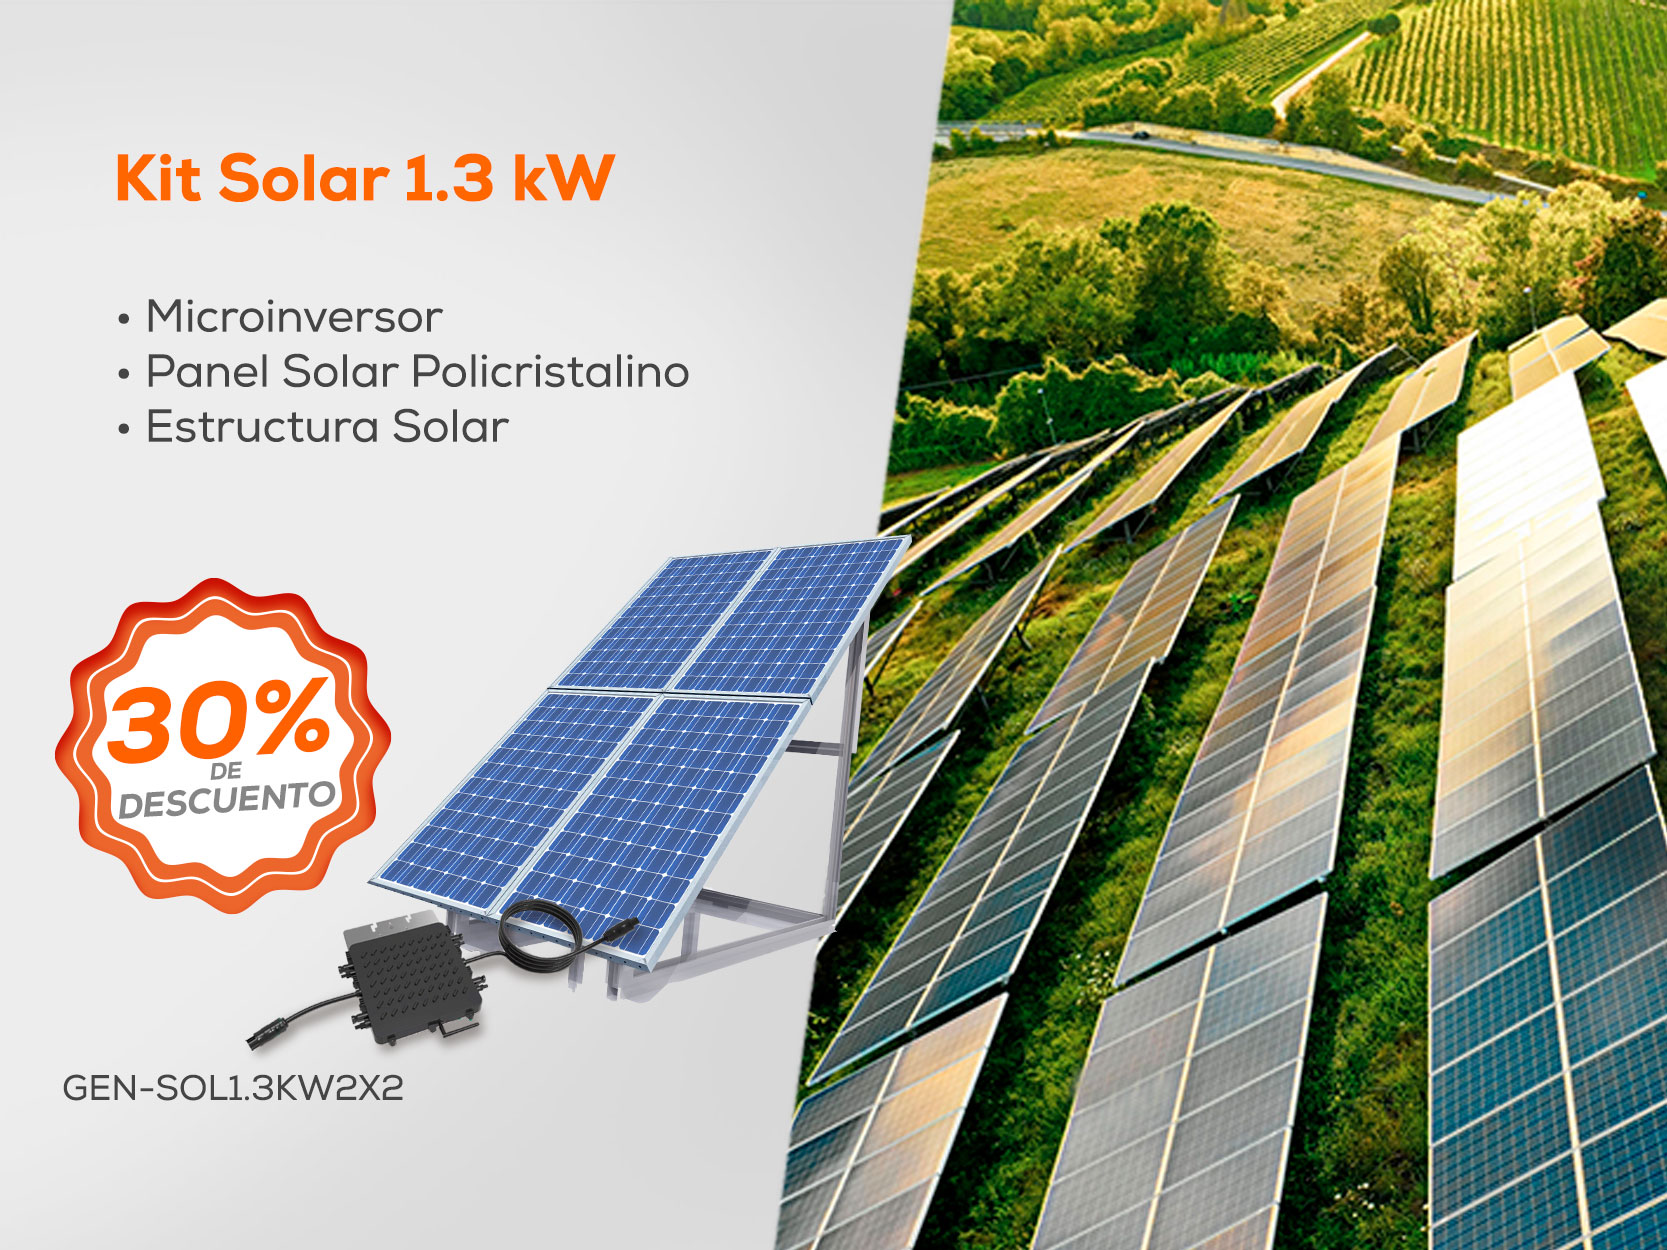 Kit Solar 1.3 kW - Microinversor - Panel Solar- Estructura Solar